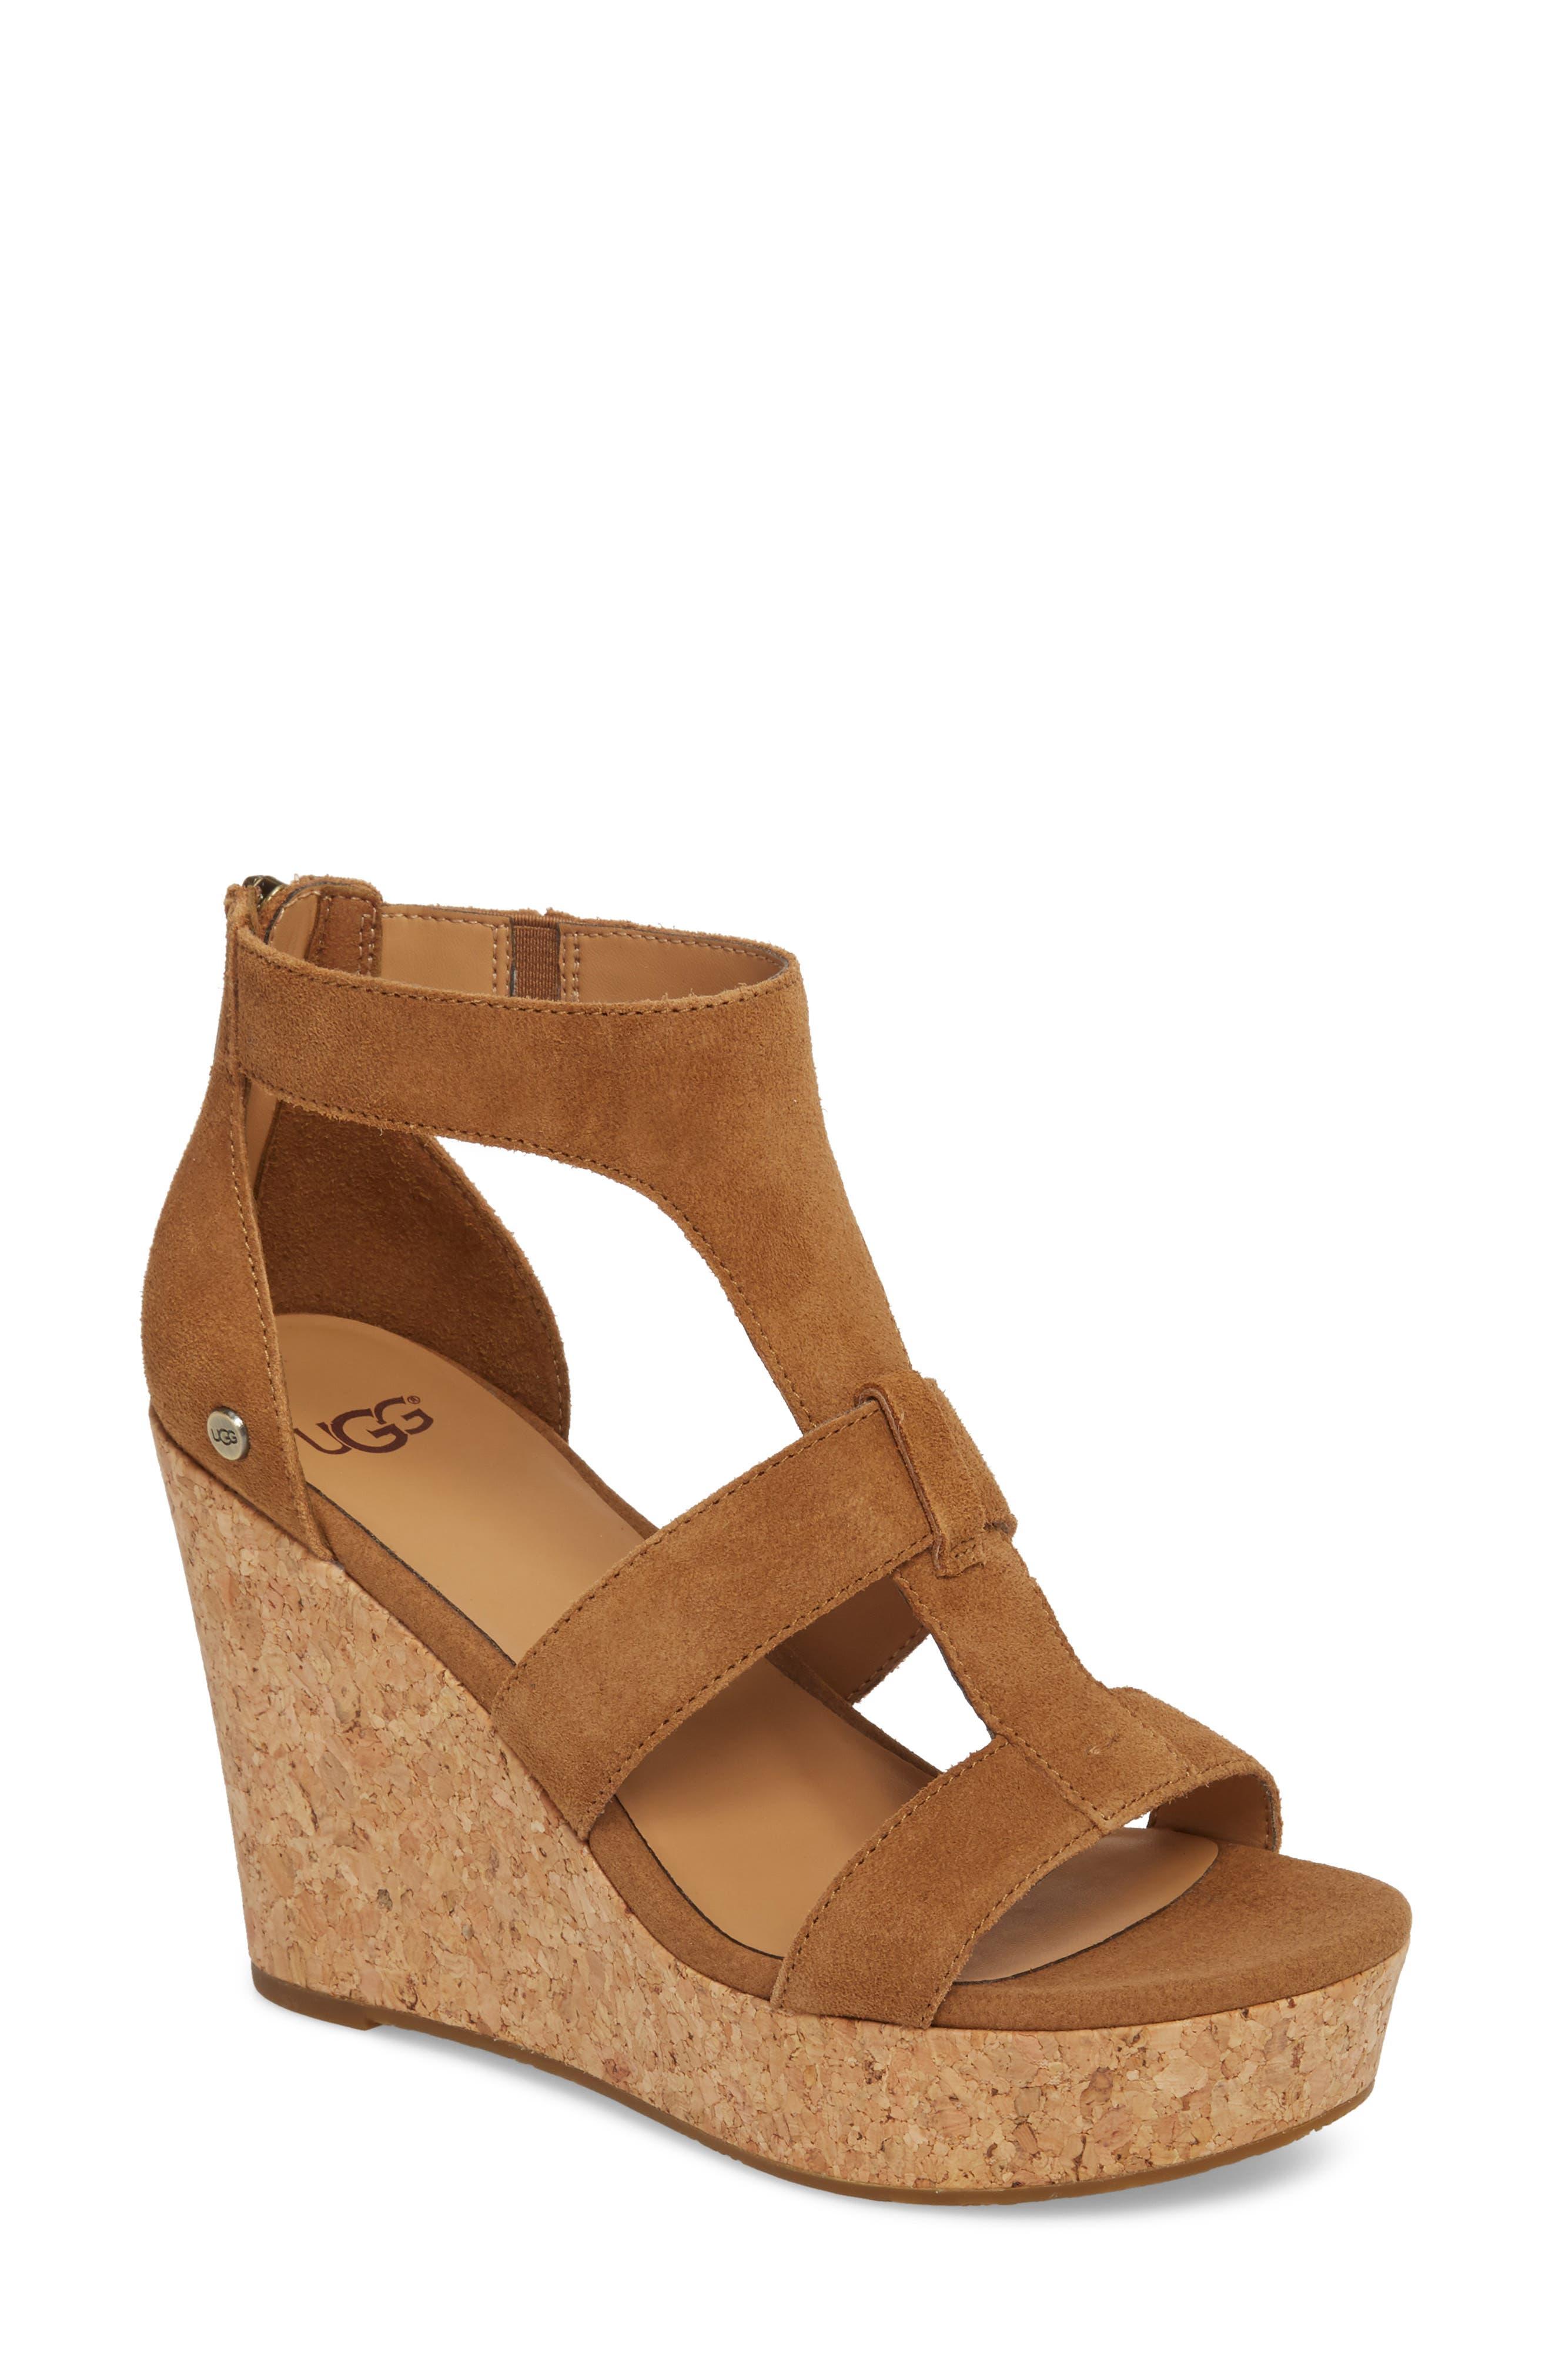 Whitney Platform Wedge Sandal,                         Main,                         color, Chestnut